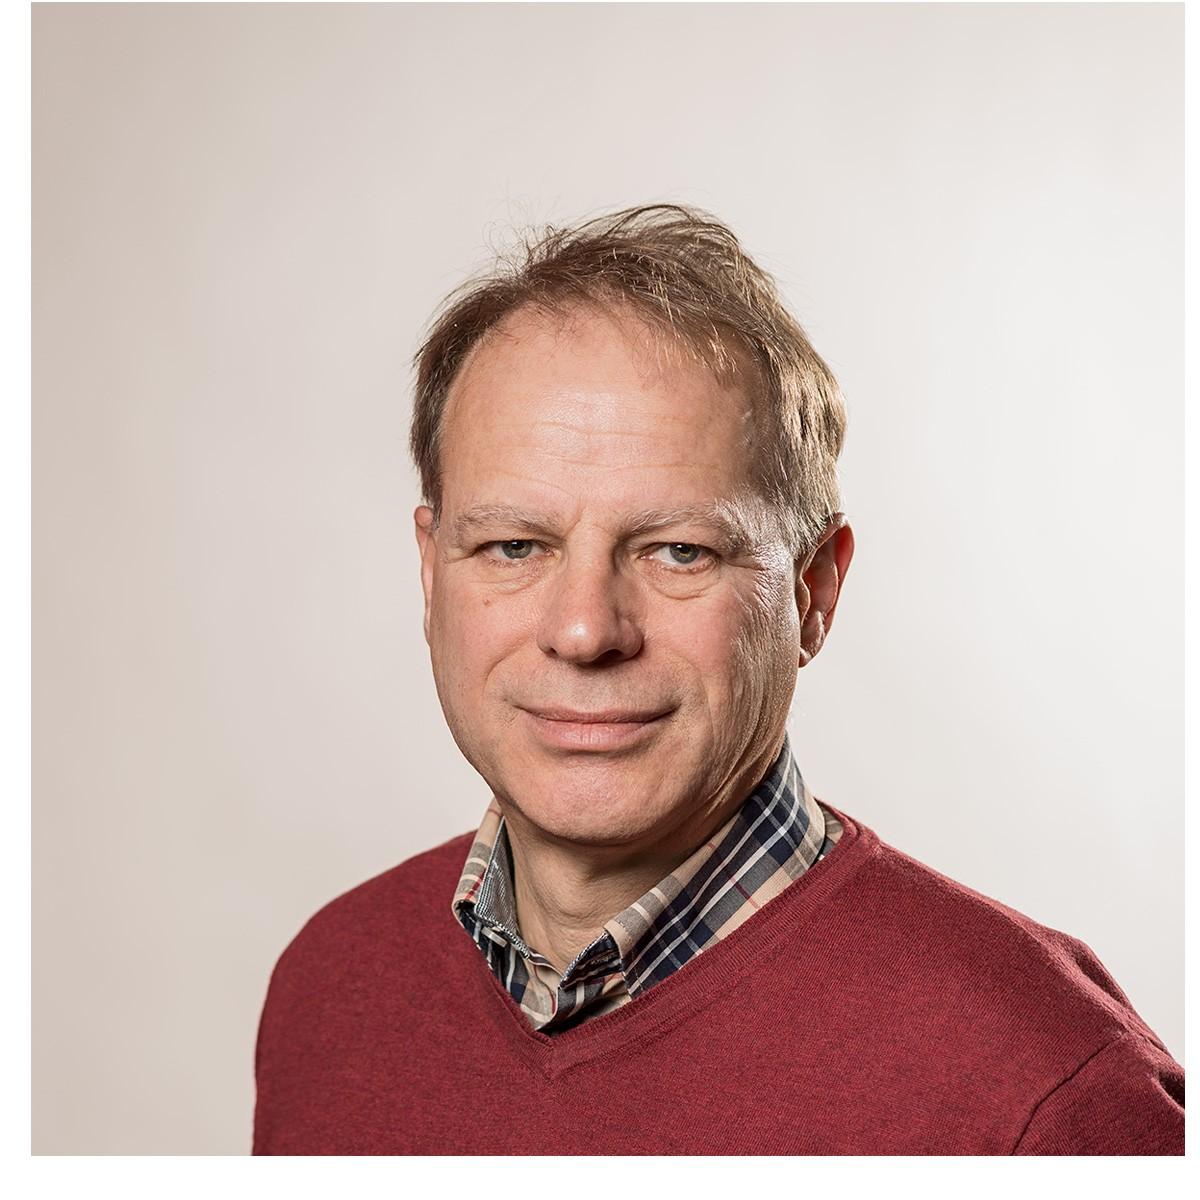 Nicolaas Wertenbroek